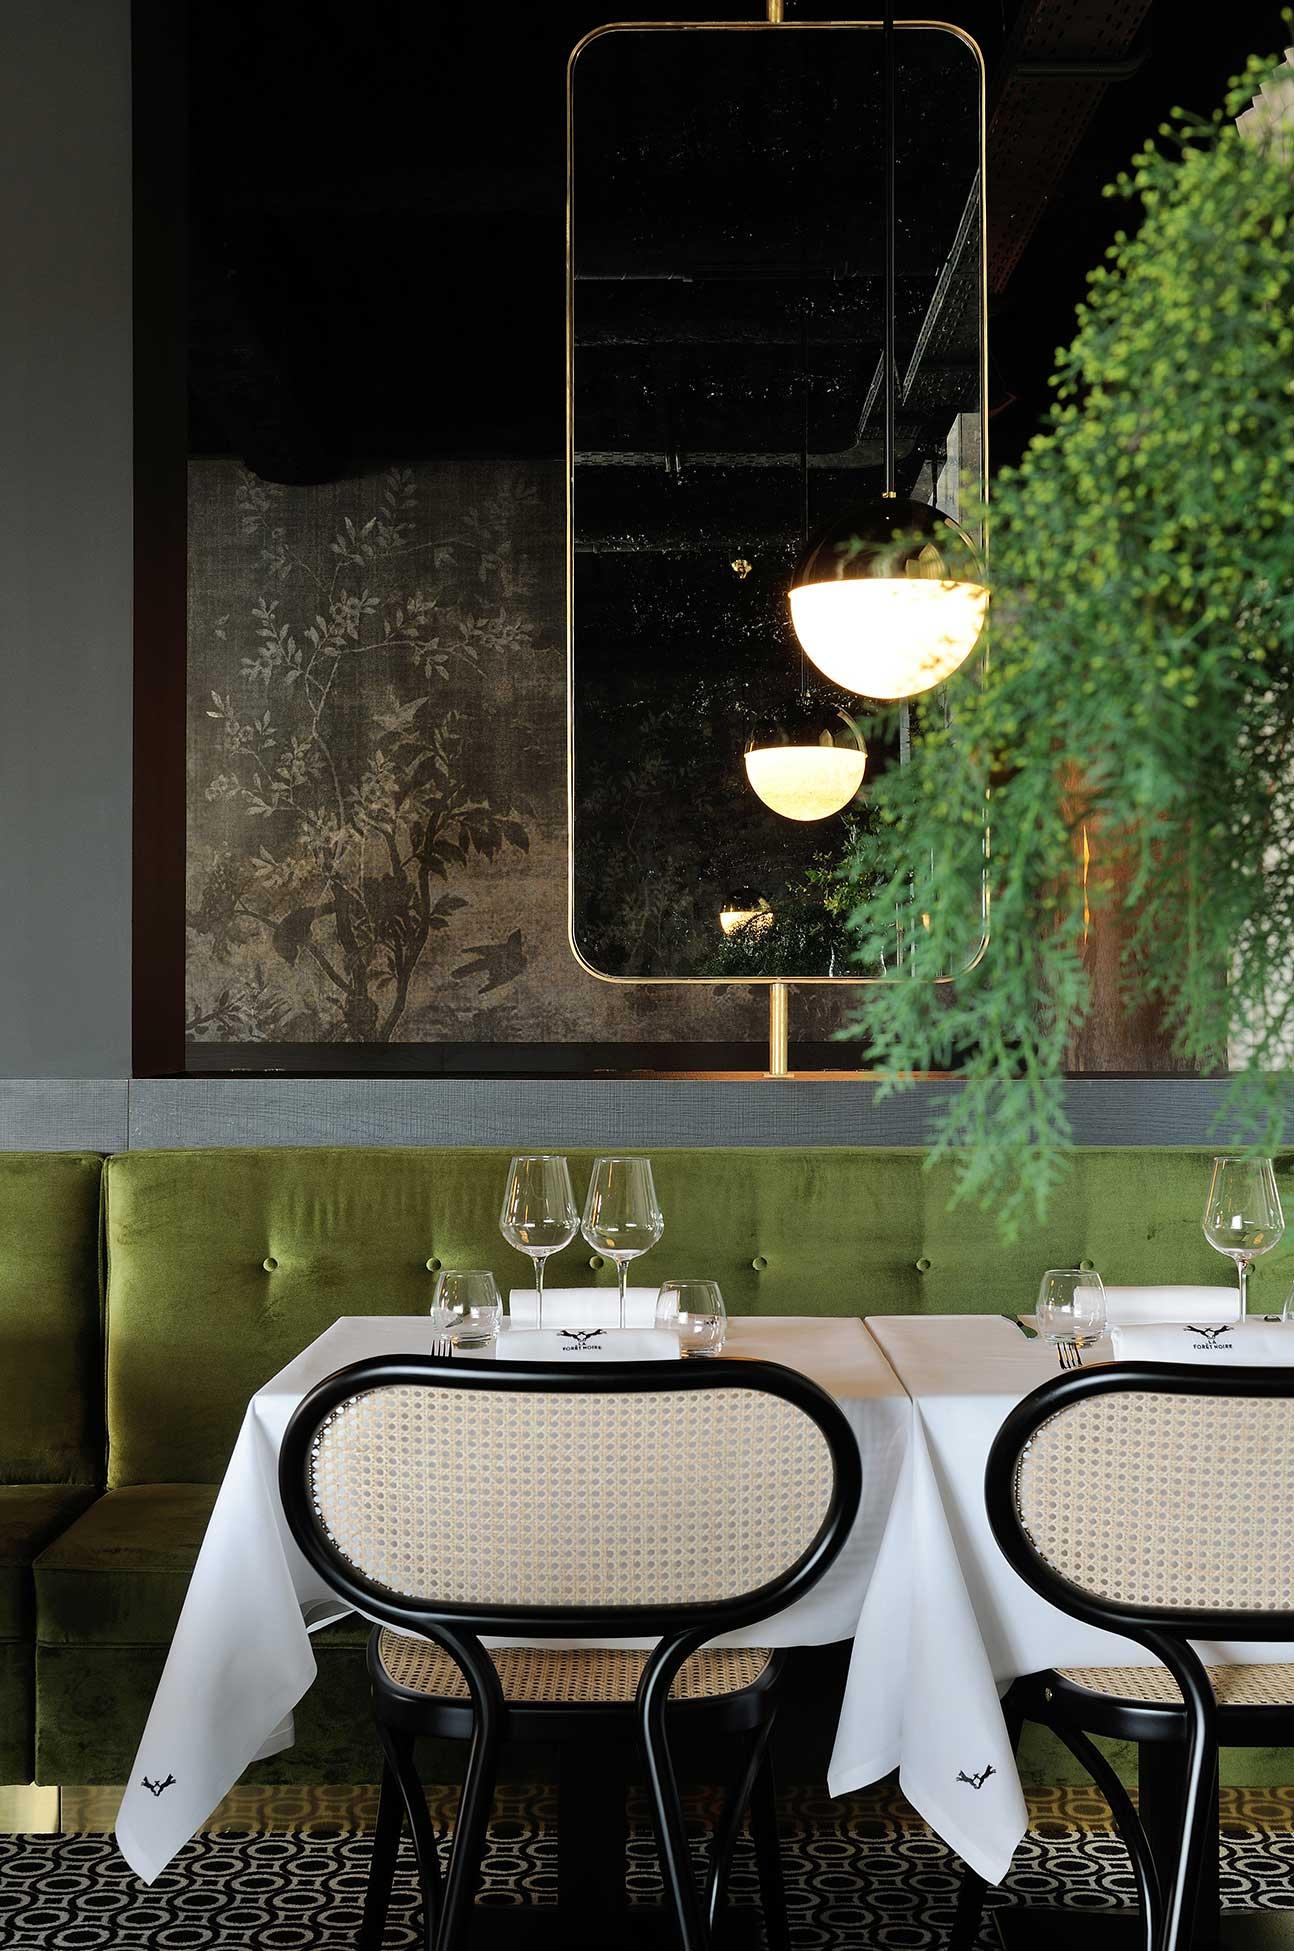 la foret noire restaurant in chaponost france by claude cartier. Black Bedroom Furniture Sets. Home Design Ideas